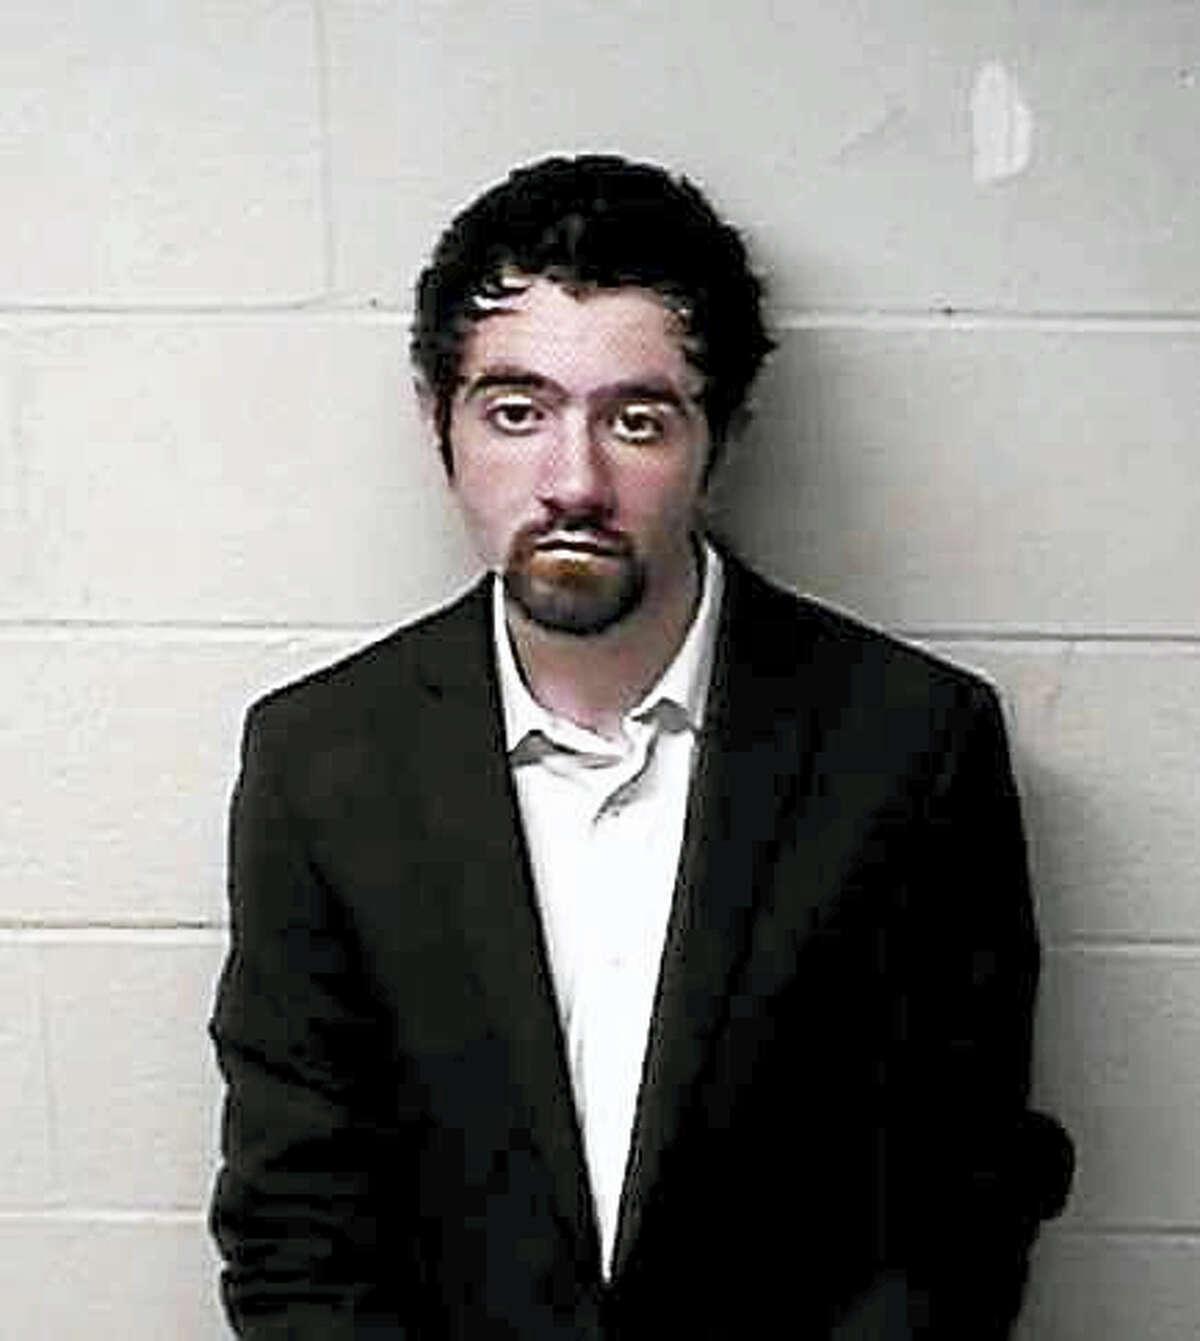 Zachary Campanelli